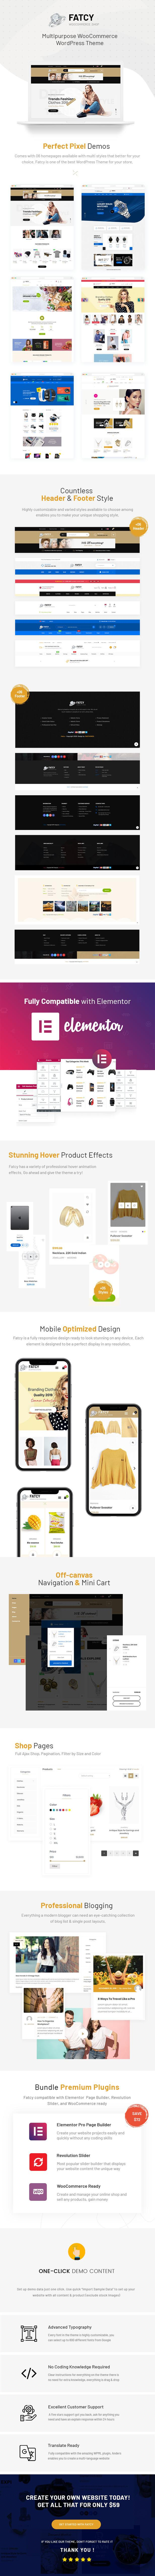 Fatcy - Multipurpose WooCommerce WordPress Theme - 1